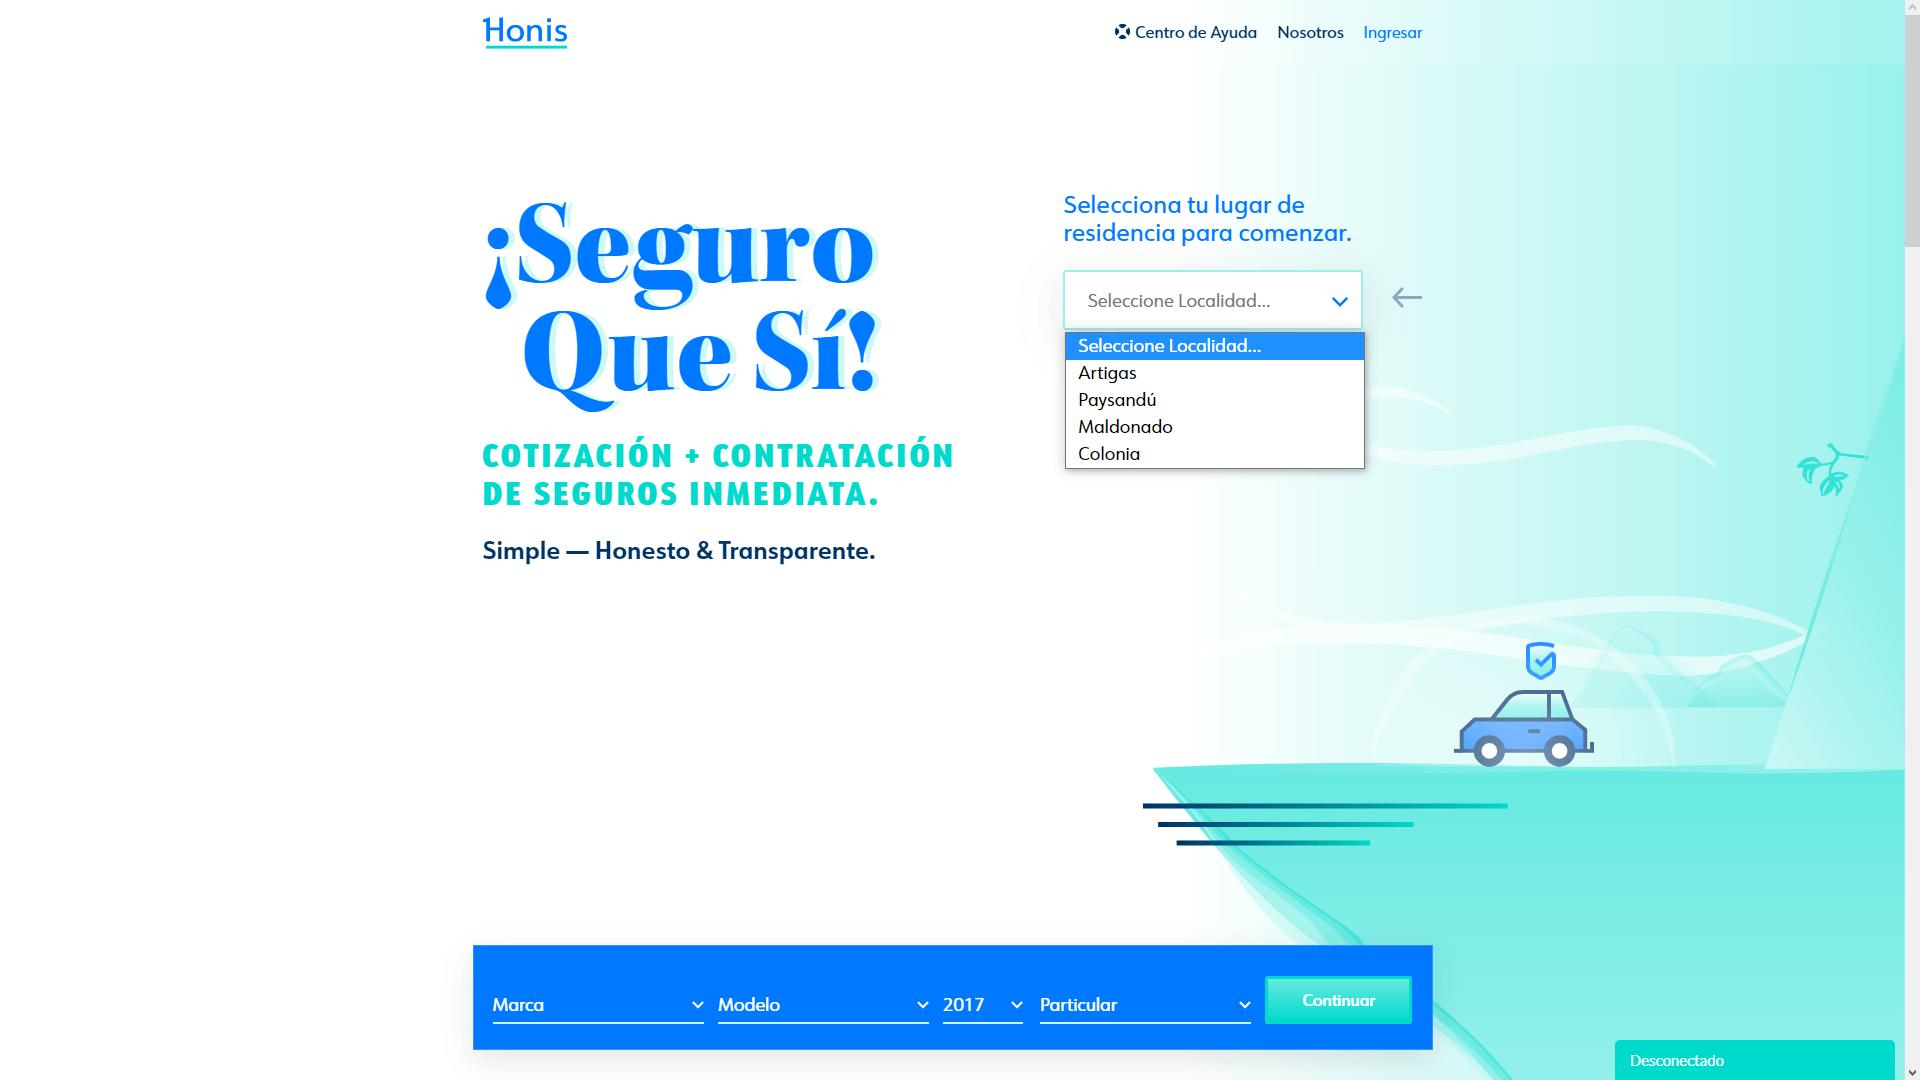 User interface -  Honis